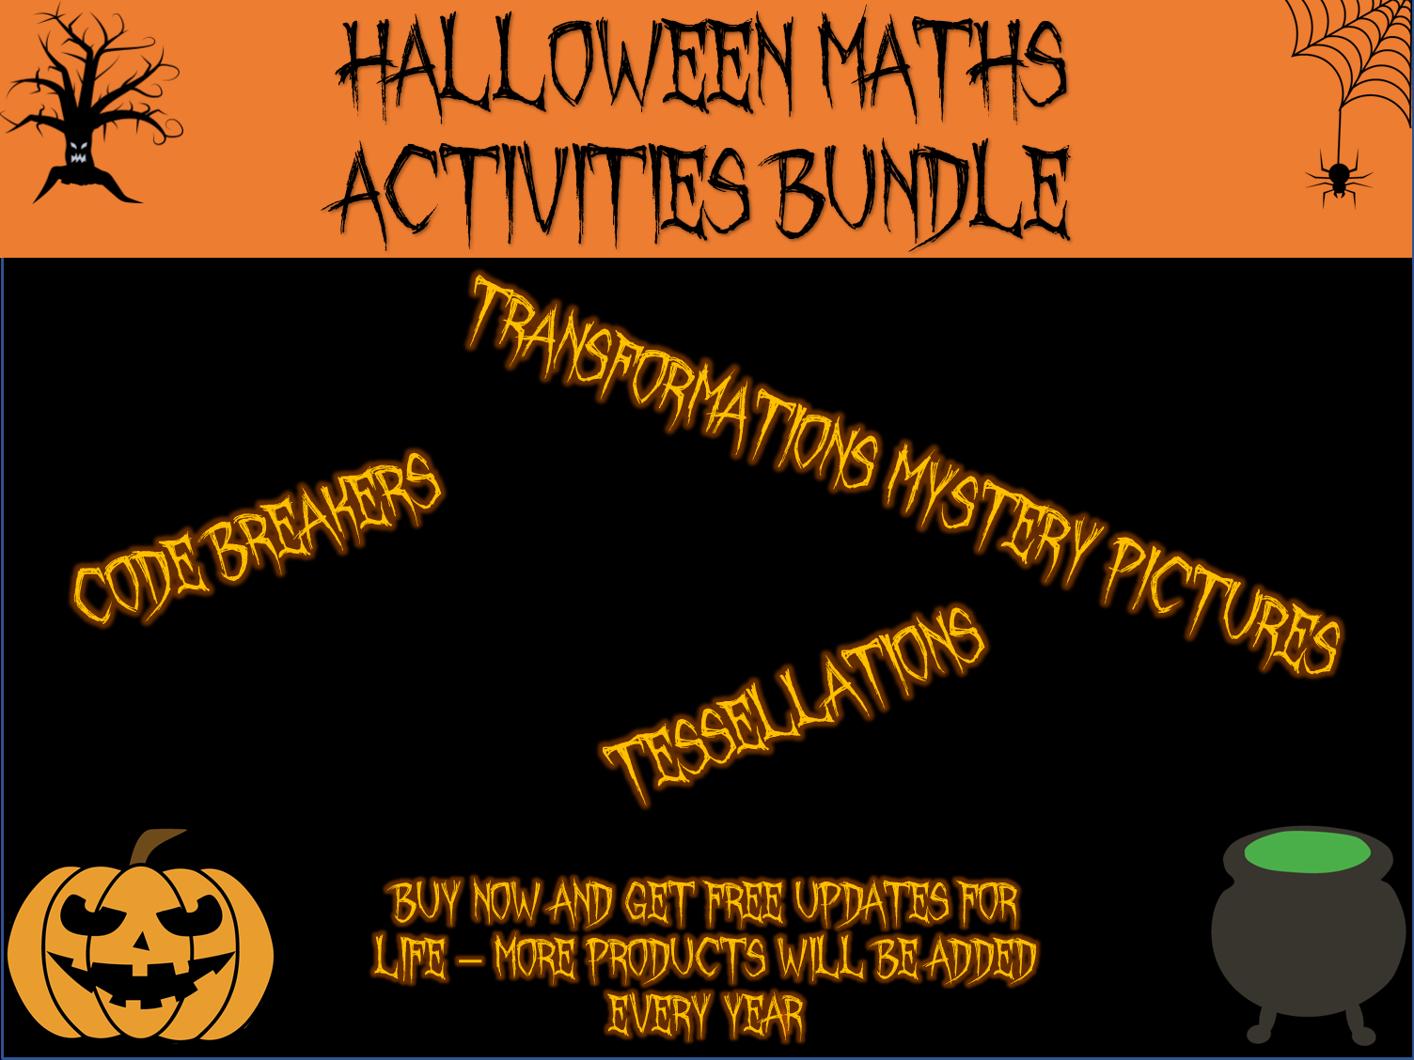 Halloween Maths - activities growing bundle